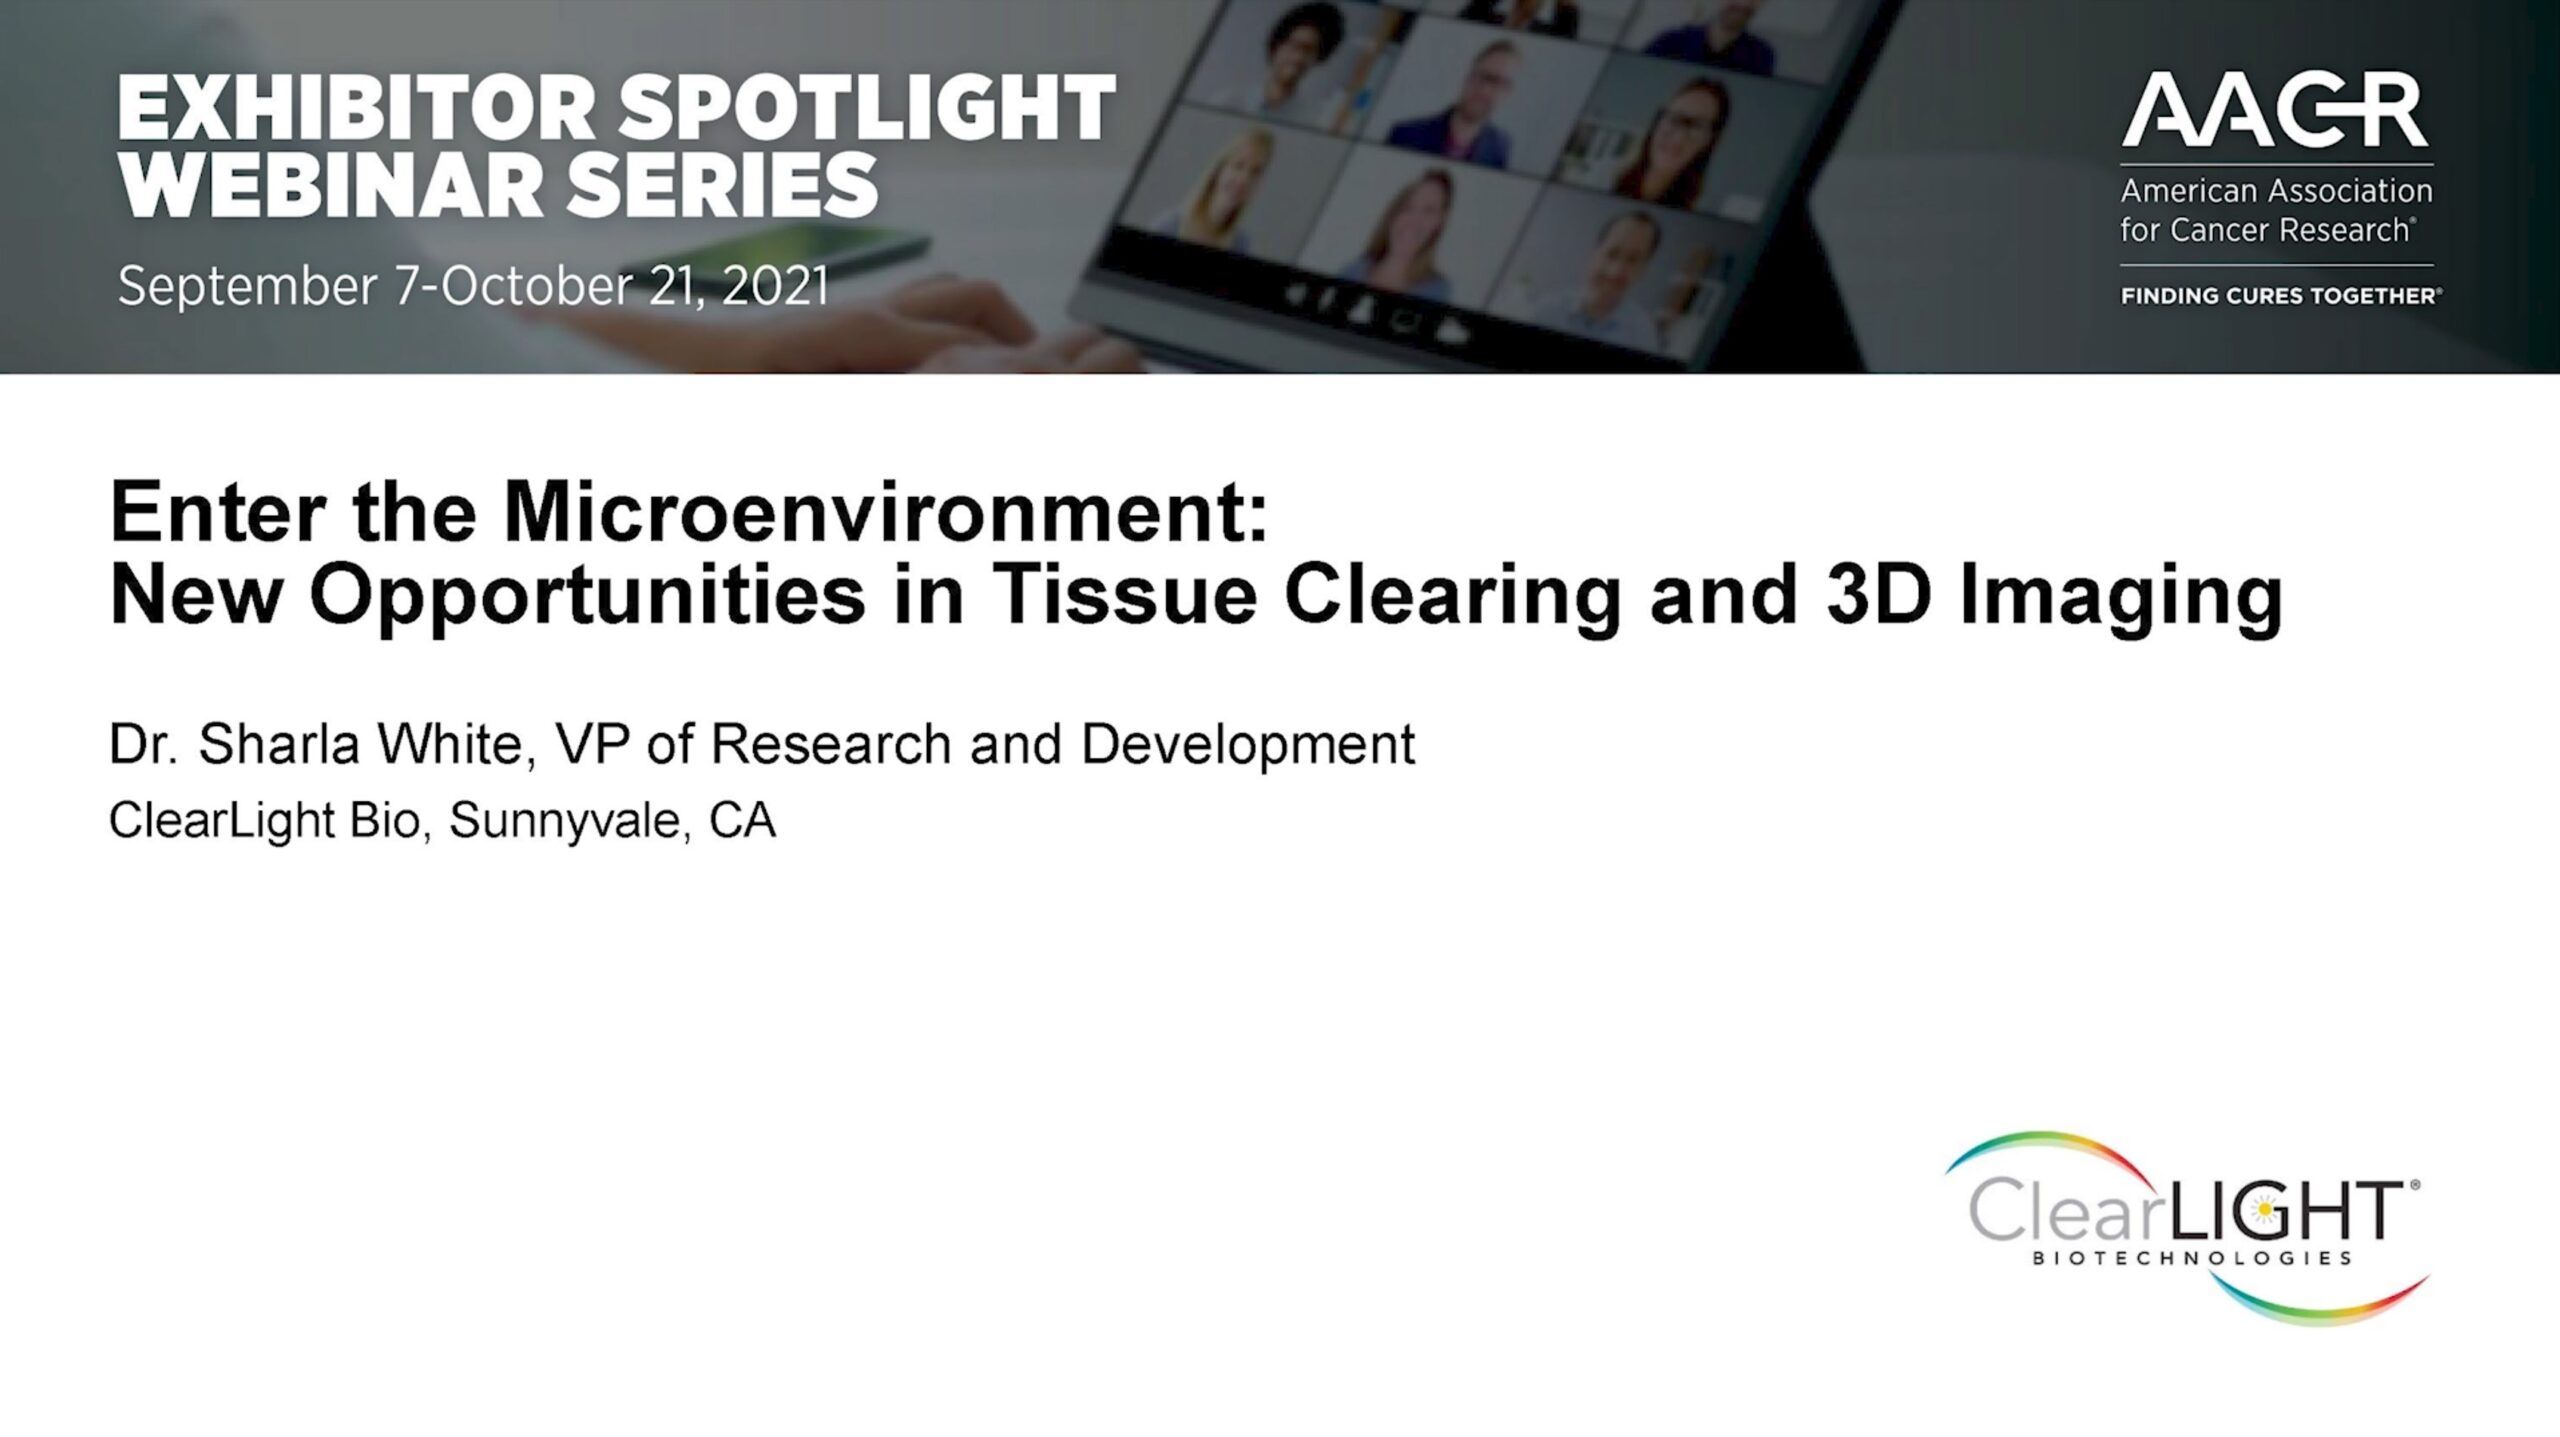 AACR Webinar with ClearLight Bio